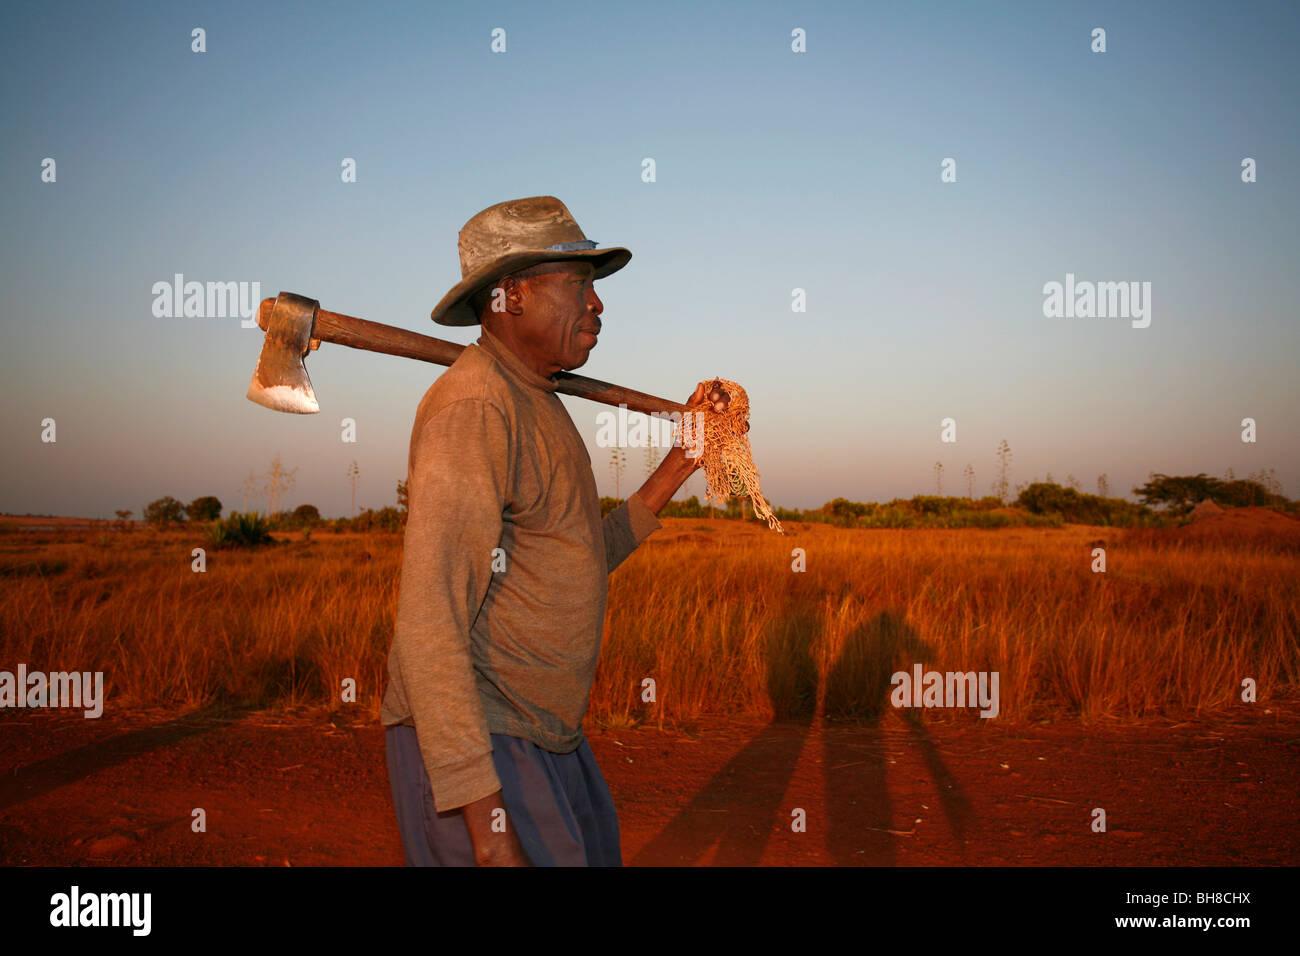 Angolan man walks through a field with an ax next to the Longa river near Jamba, Angola, July 2008. - Stock Image